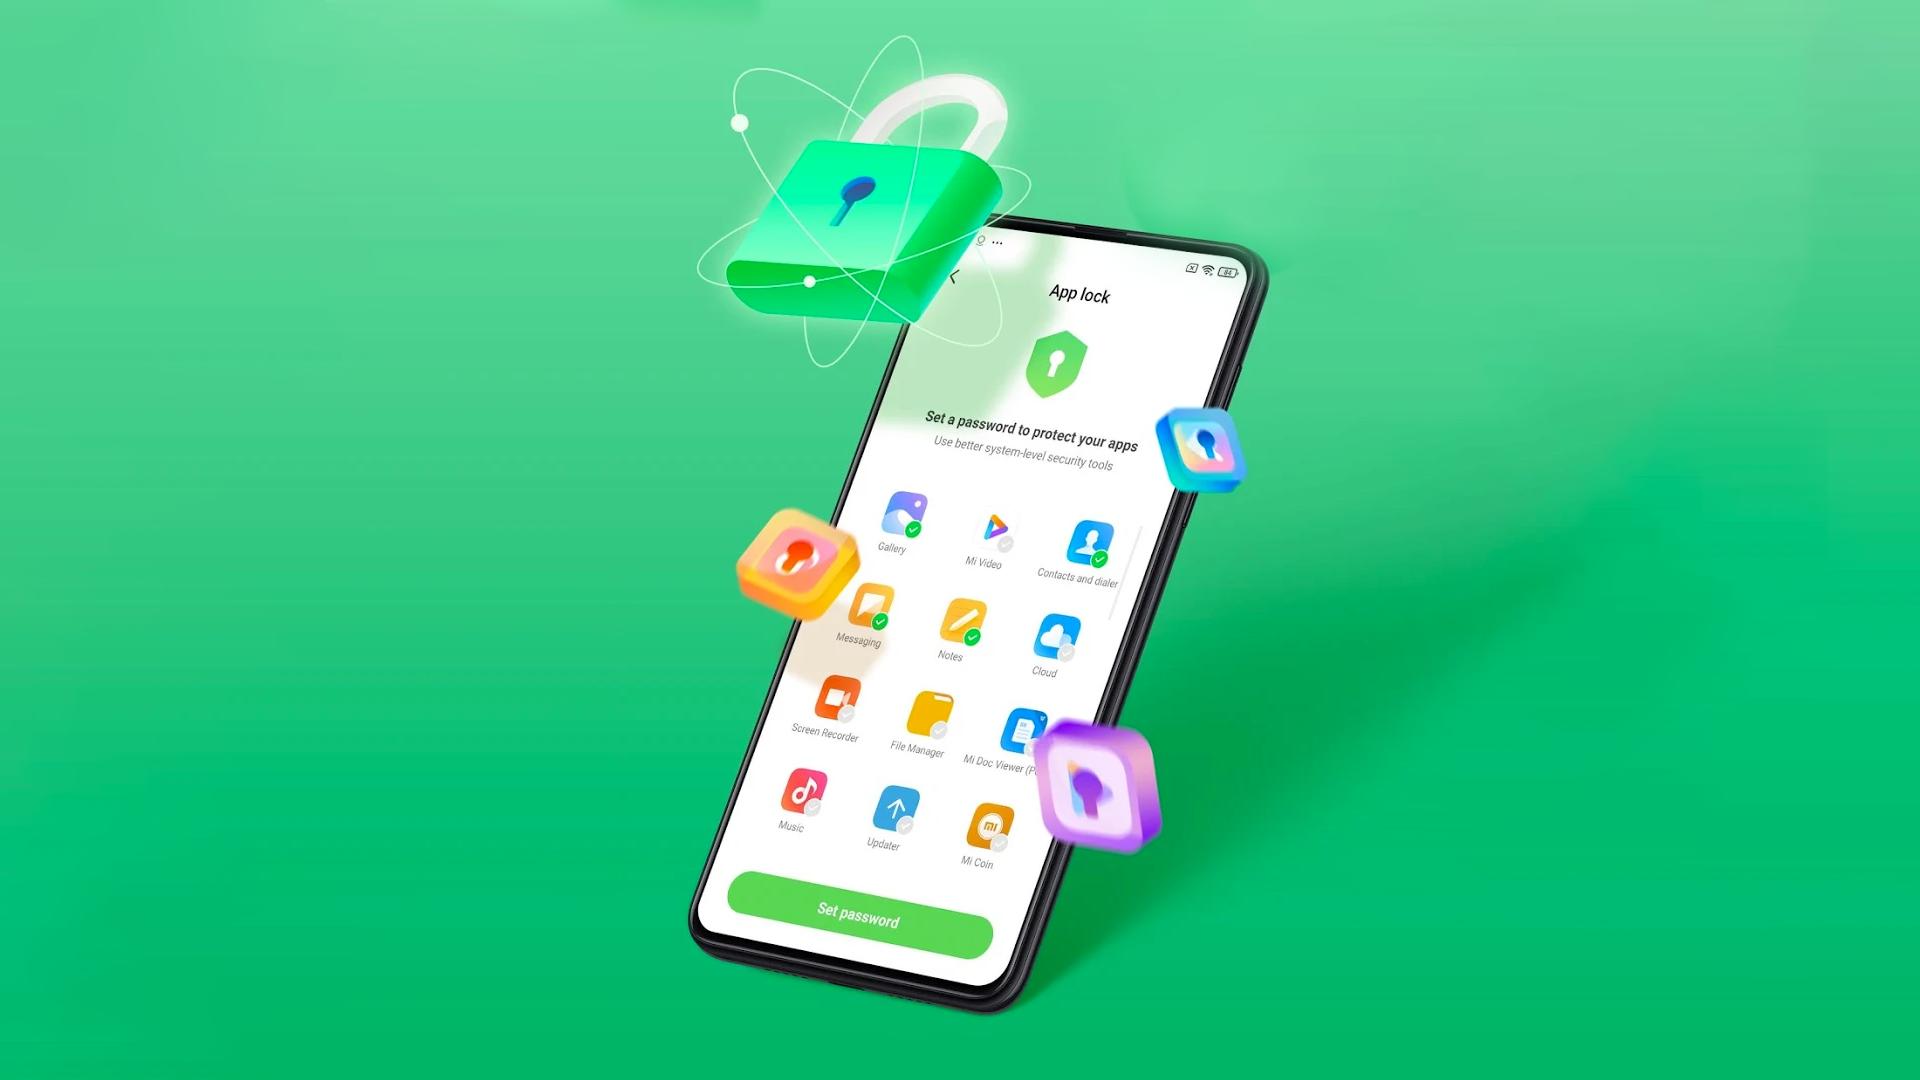 لتحديثات أسرع شاومي توفّر تطبيقها MIUI Security على متجر جوجل بلاي أندرويد